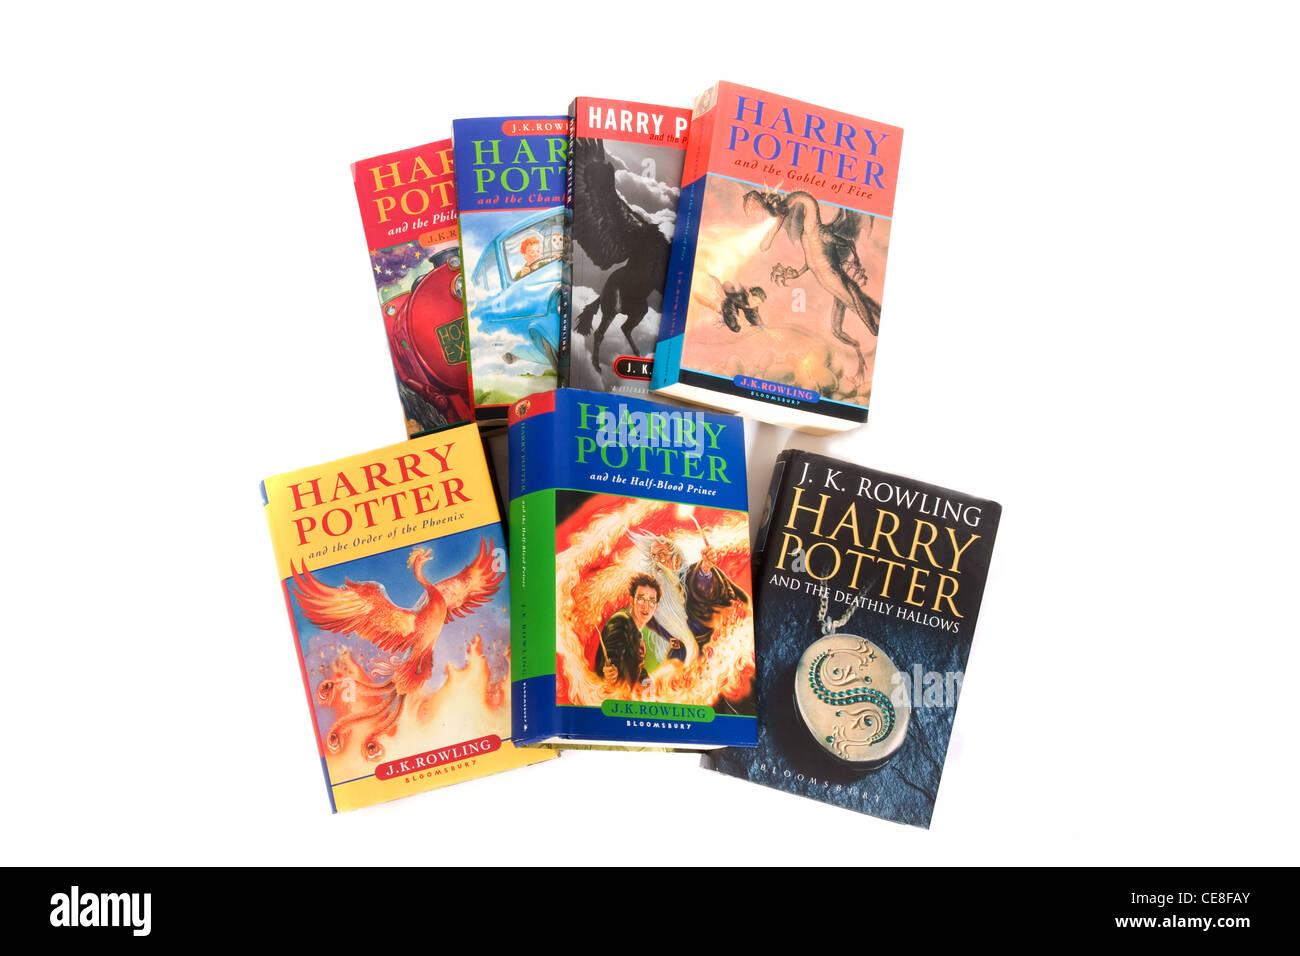 All seven Harry Potter books. - Stock Image